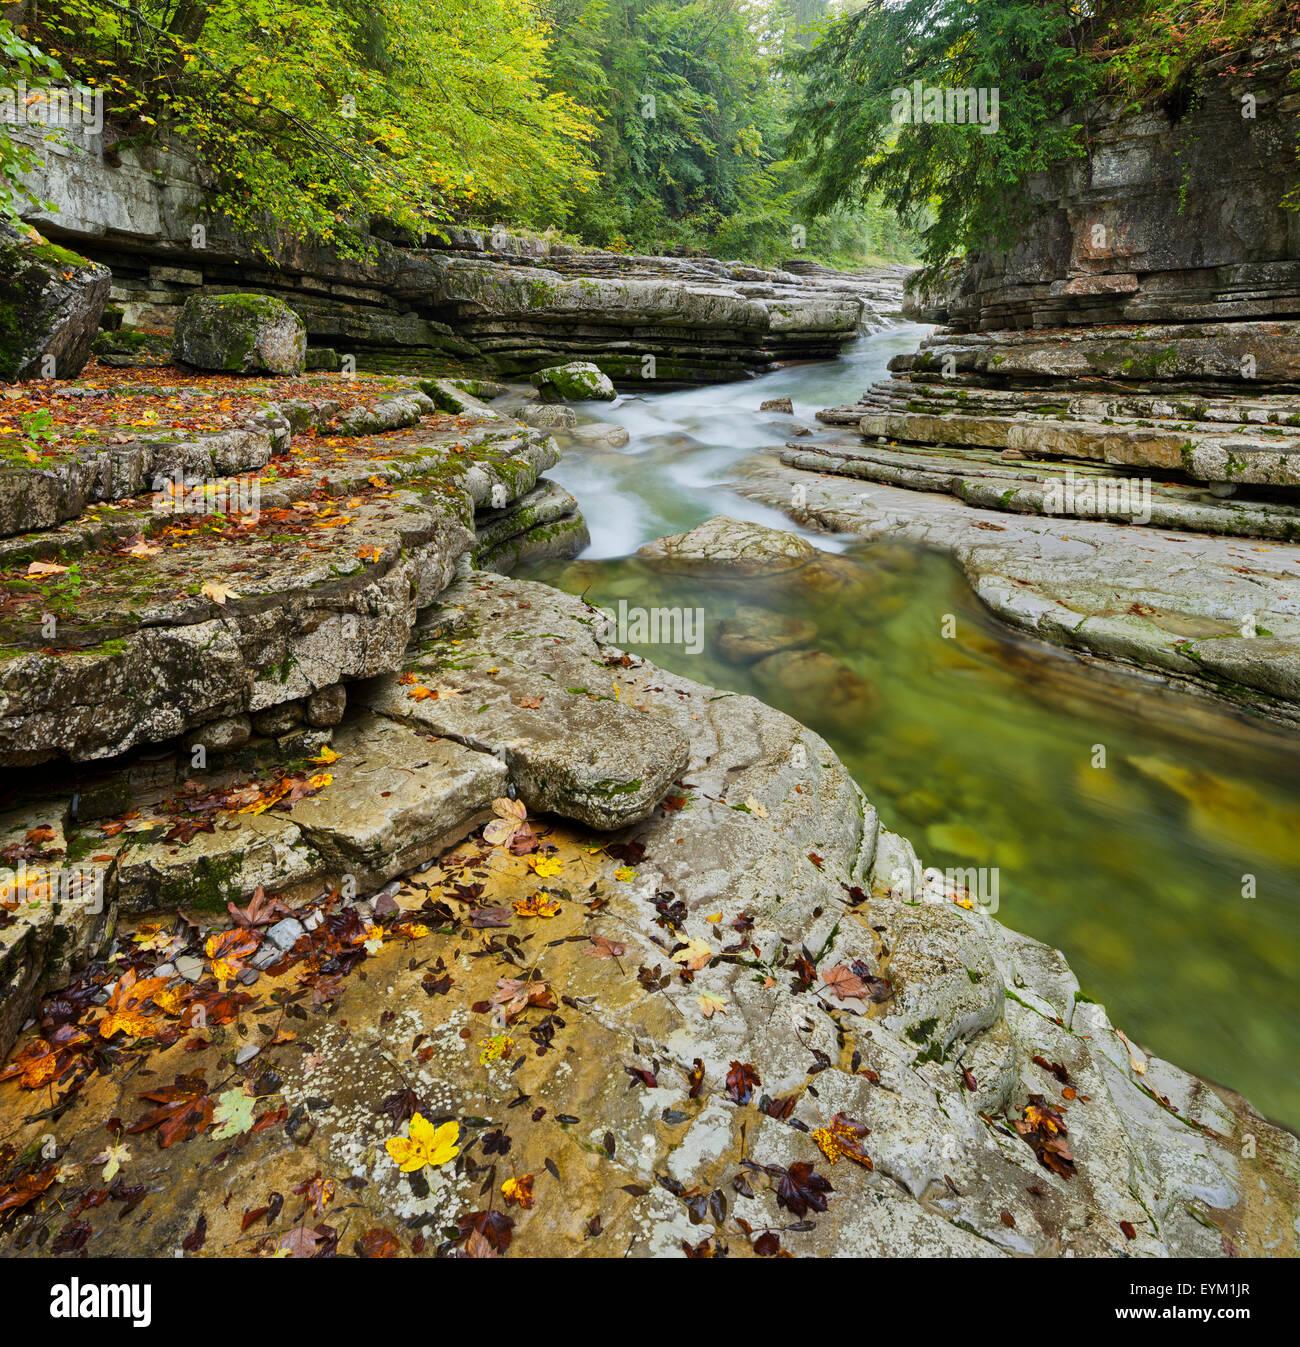 Brook Taugl, gorge, Hallein, Salzburg country, Austria, Stock Photo